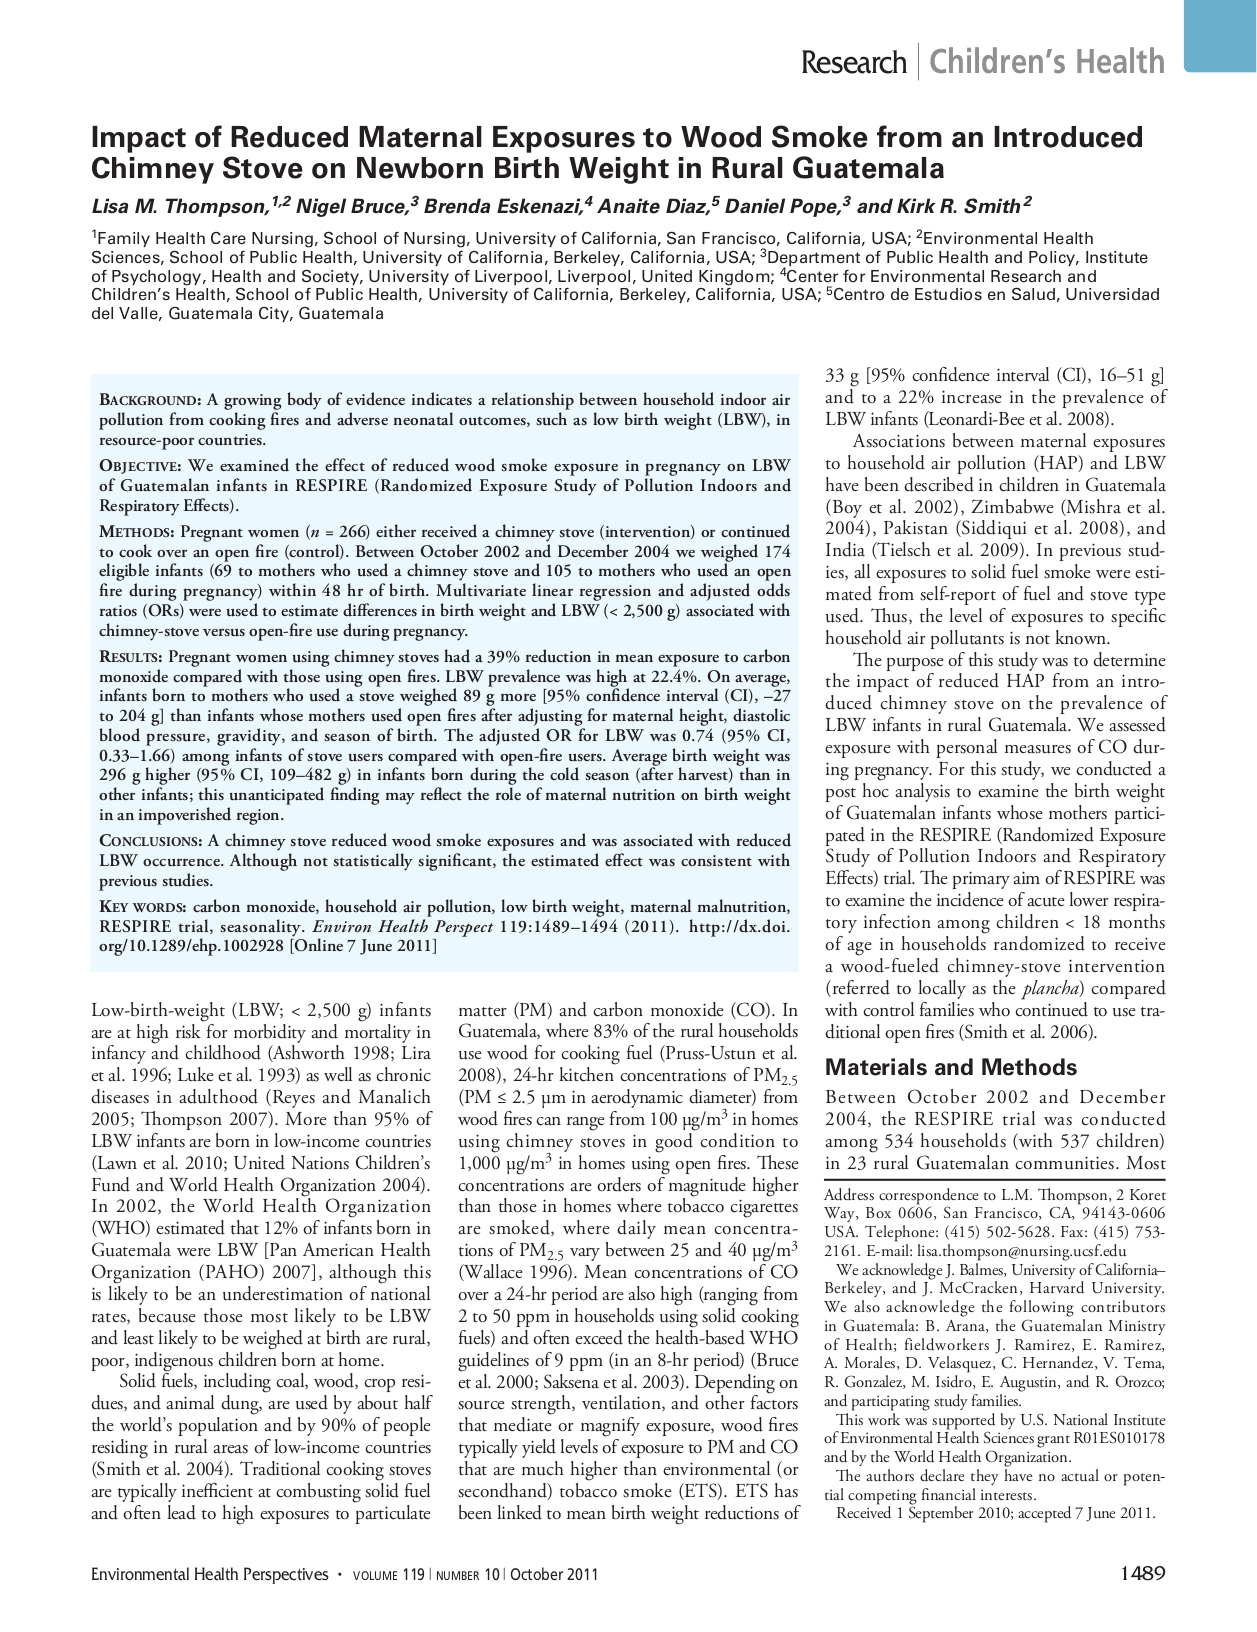 pdf for Vinotemp Refrigerator 296G manual